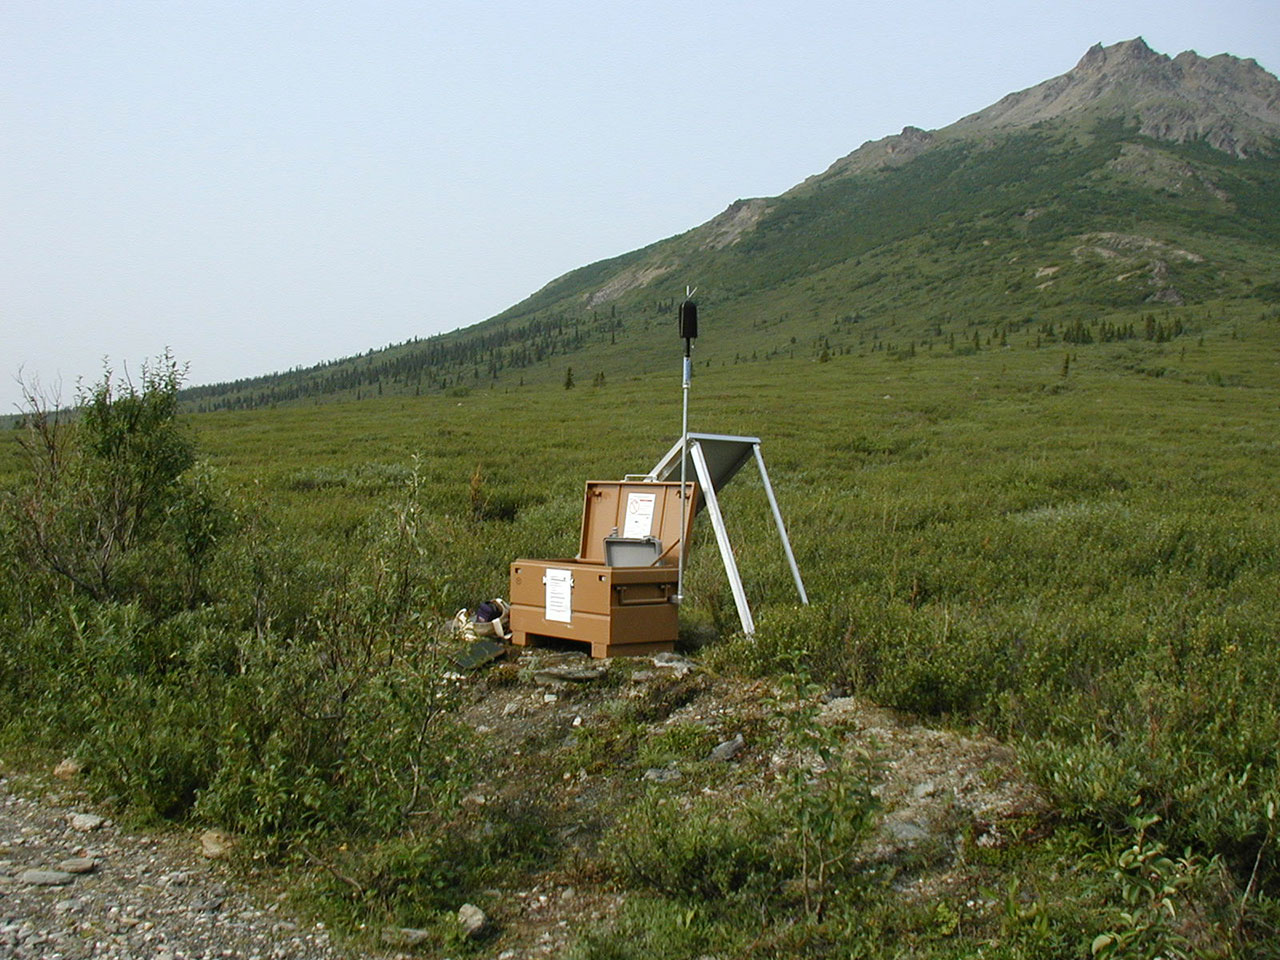 Sound monitoring equipment in Denali